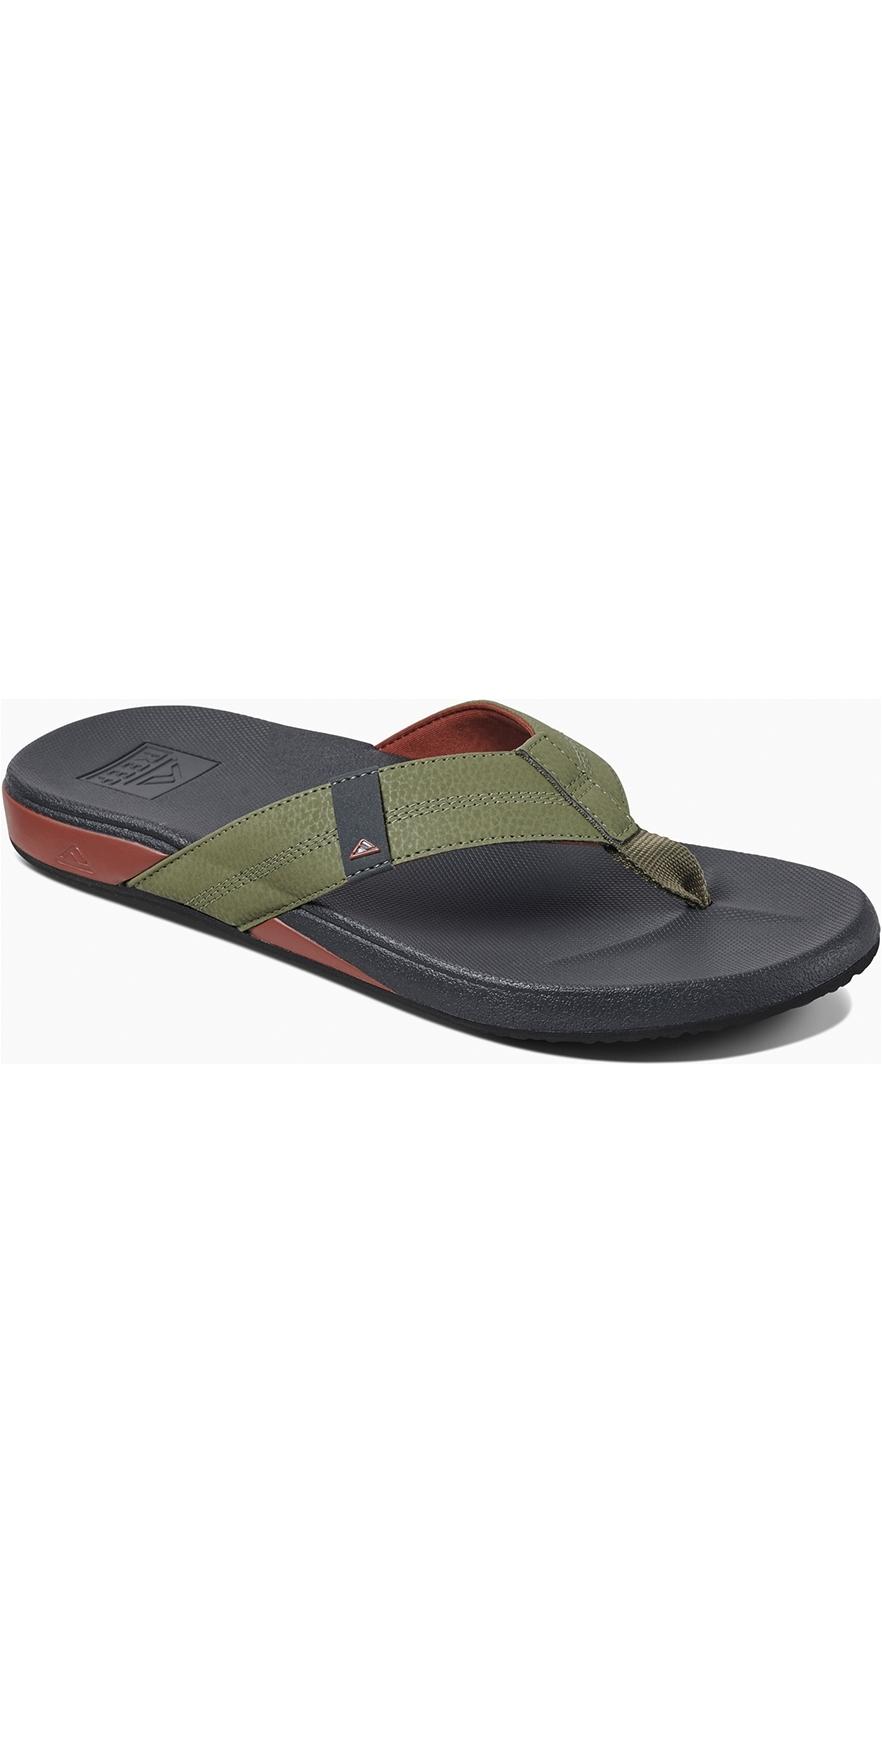 24732ca1596 Reef Mens Cushion Bounce Phantom Flip Flops Olive/Red RF0A3FDI | Footwear |  Wetsuitoutlet | Wetsuit Outlet